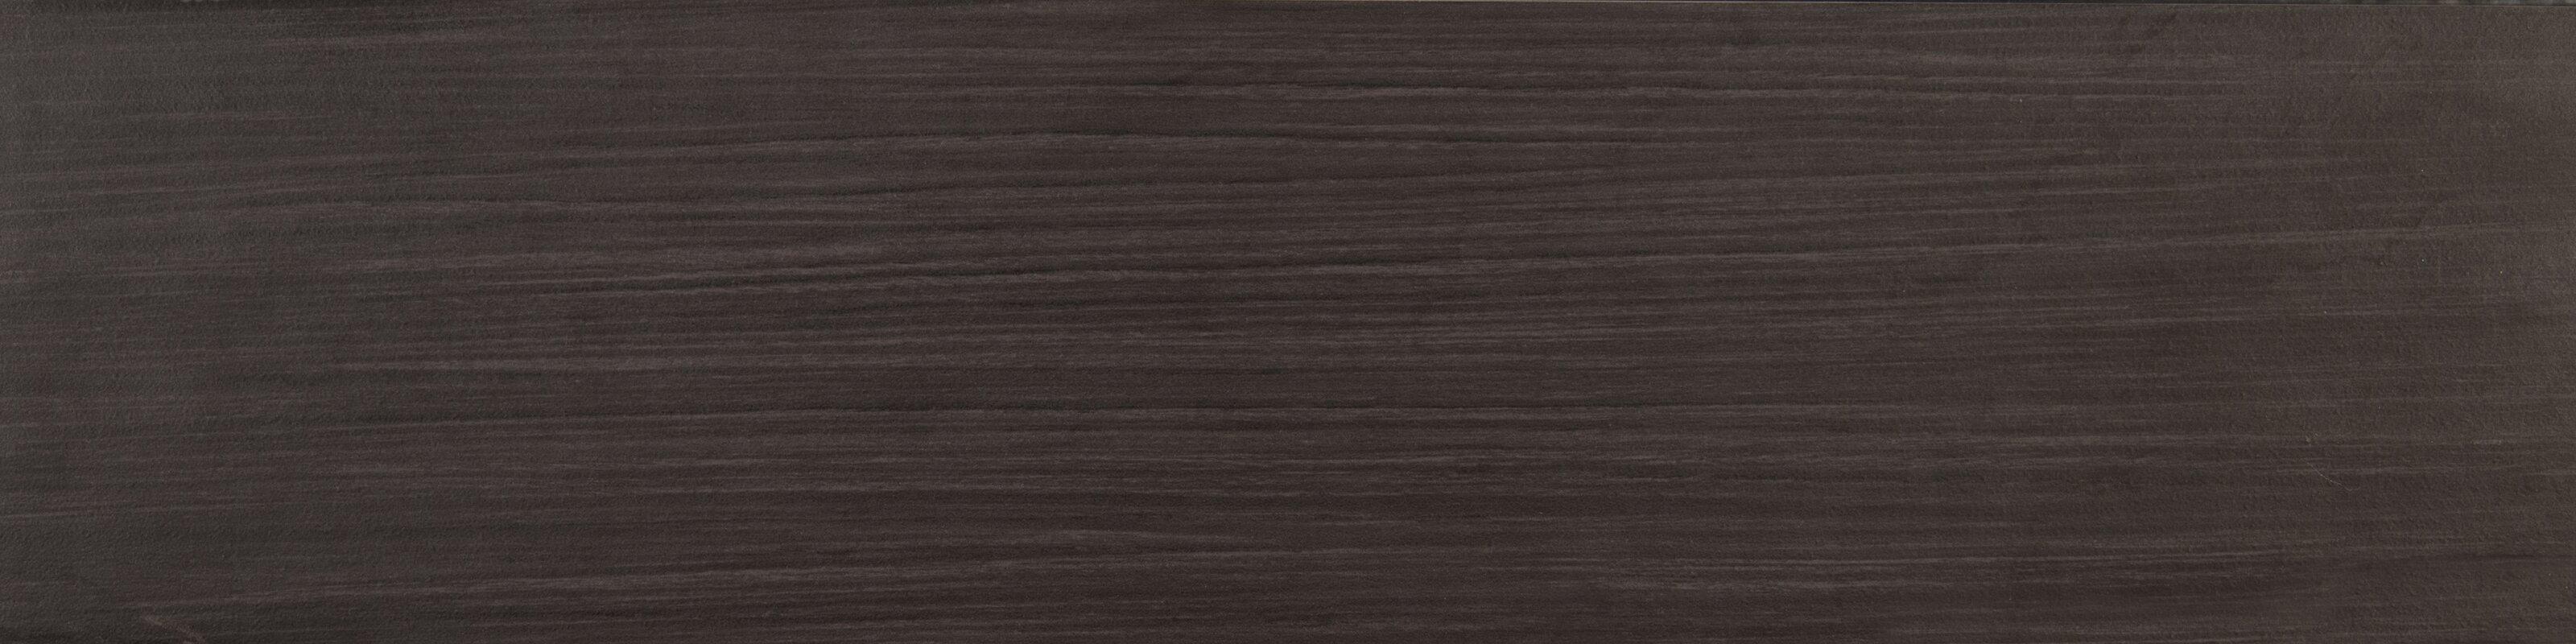 Msi sygma ebony 6 x 24 ceramic wood look tile in black reviews sygma ebony 6 x 24 ceramic wood look tile dailygadgetfo Images